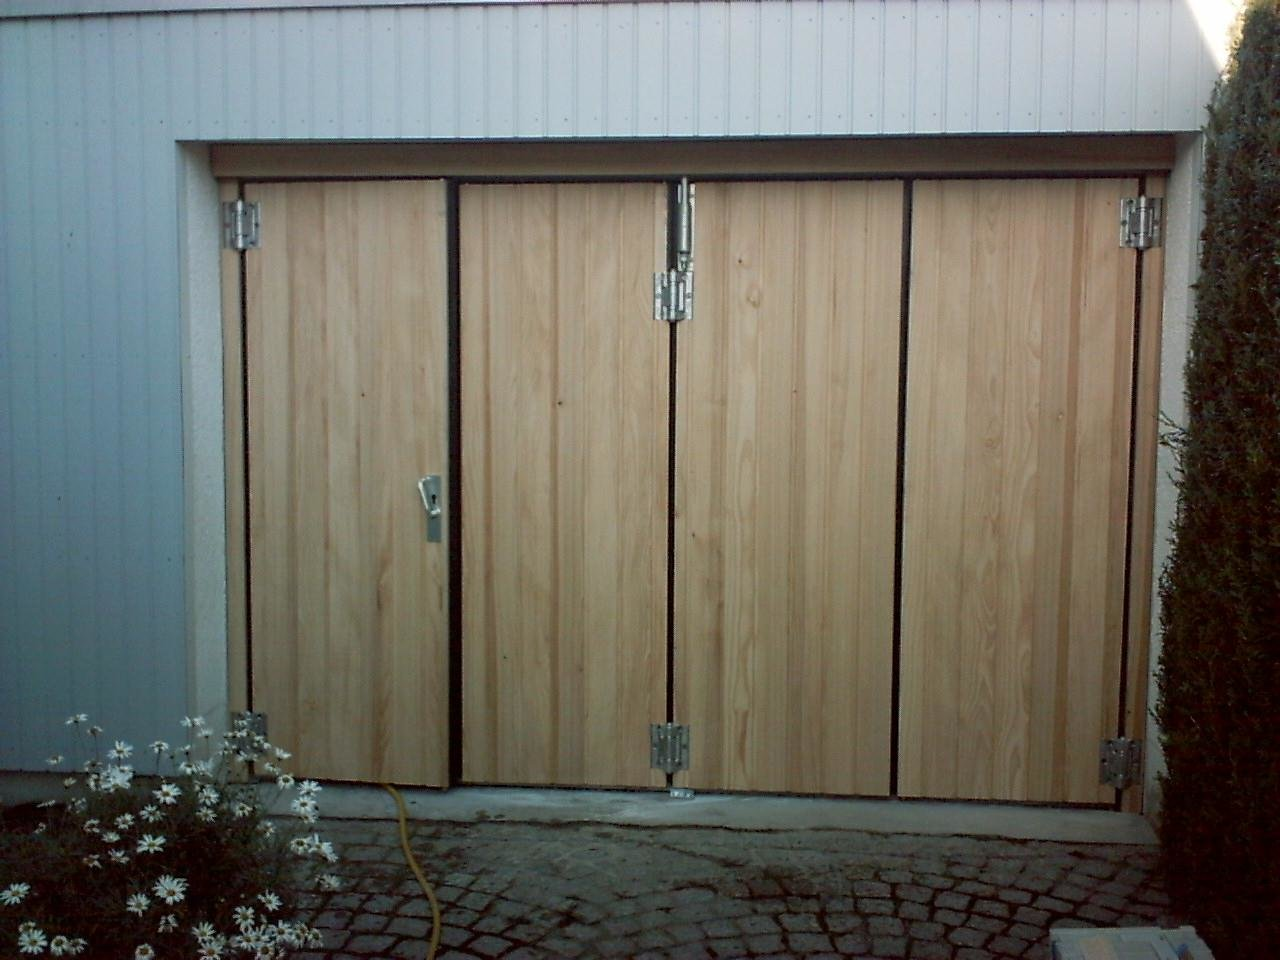 Falttor 1-3 mit Senkrechter Holzverkleidung - öffnend